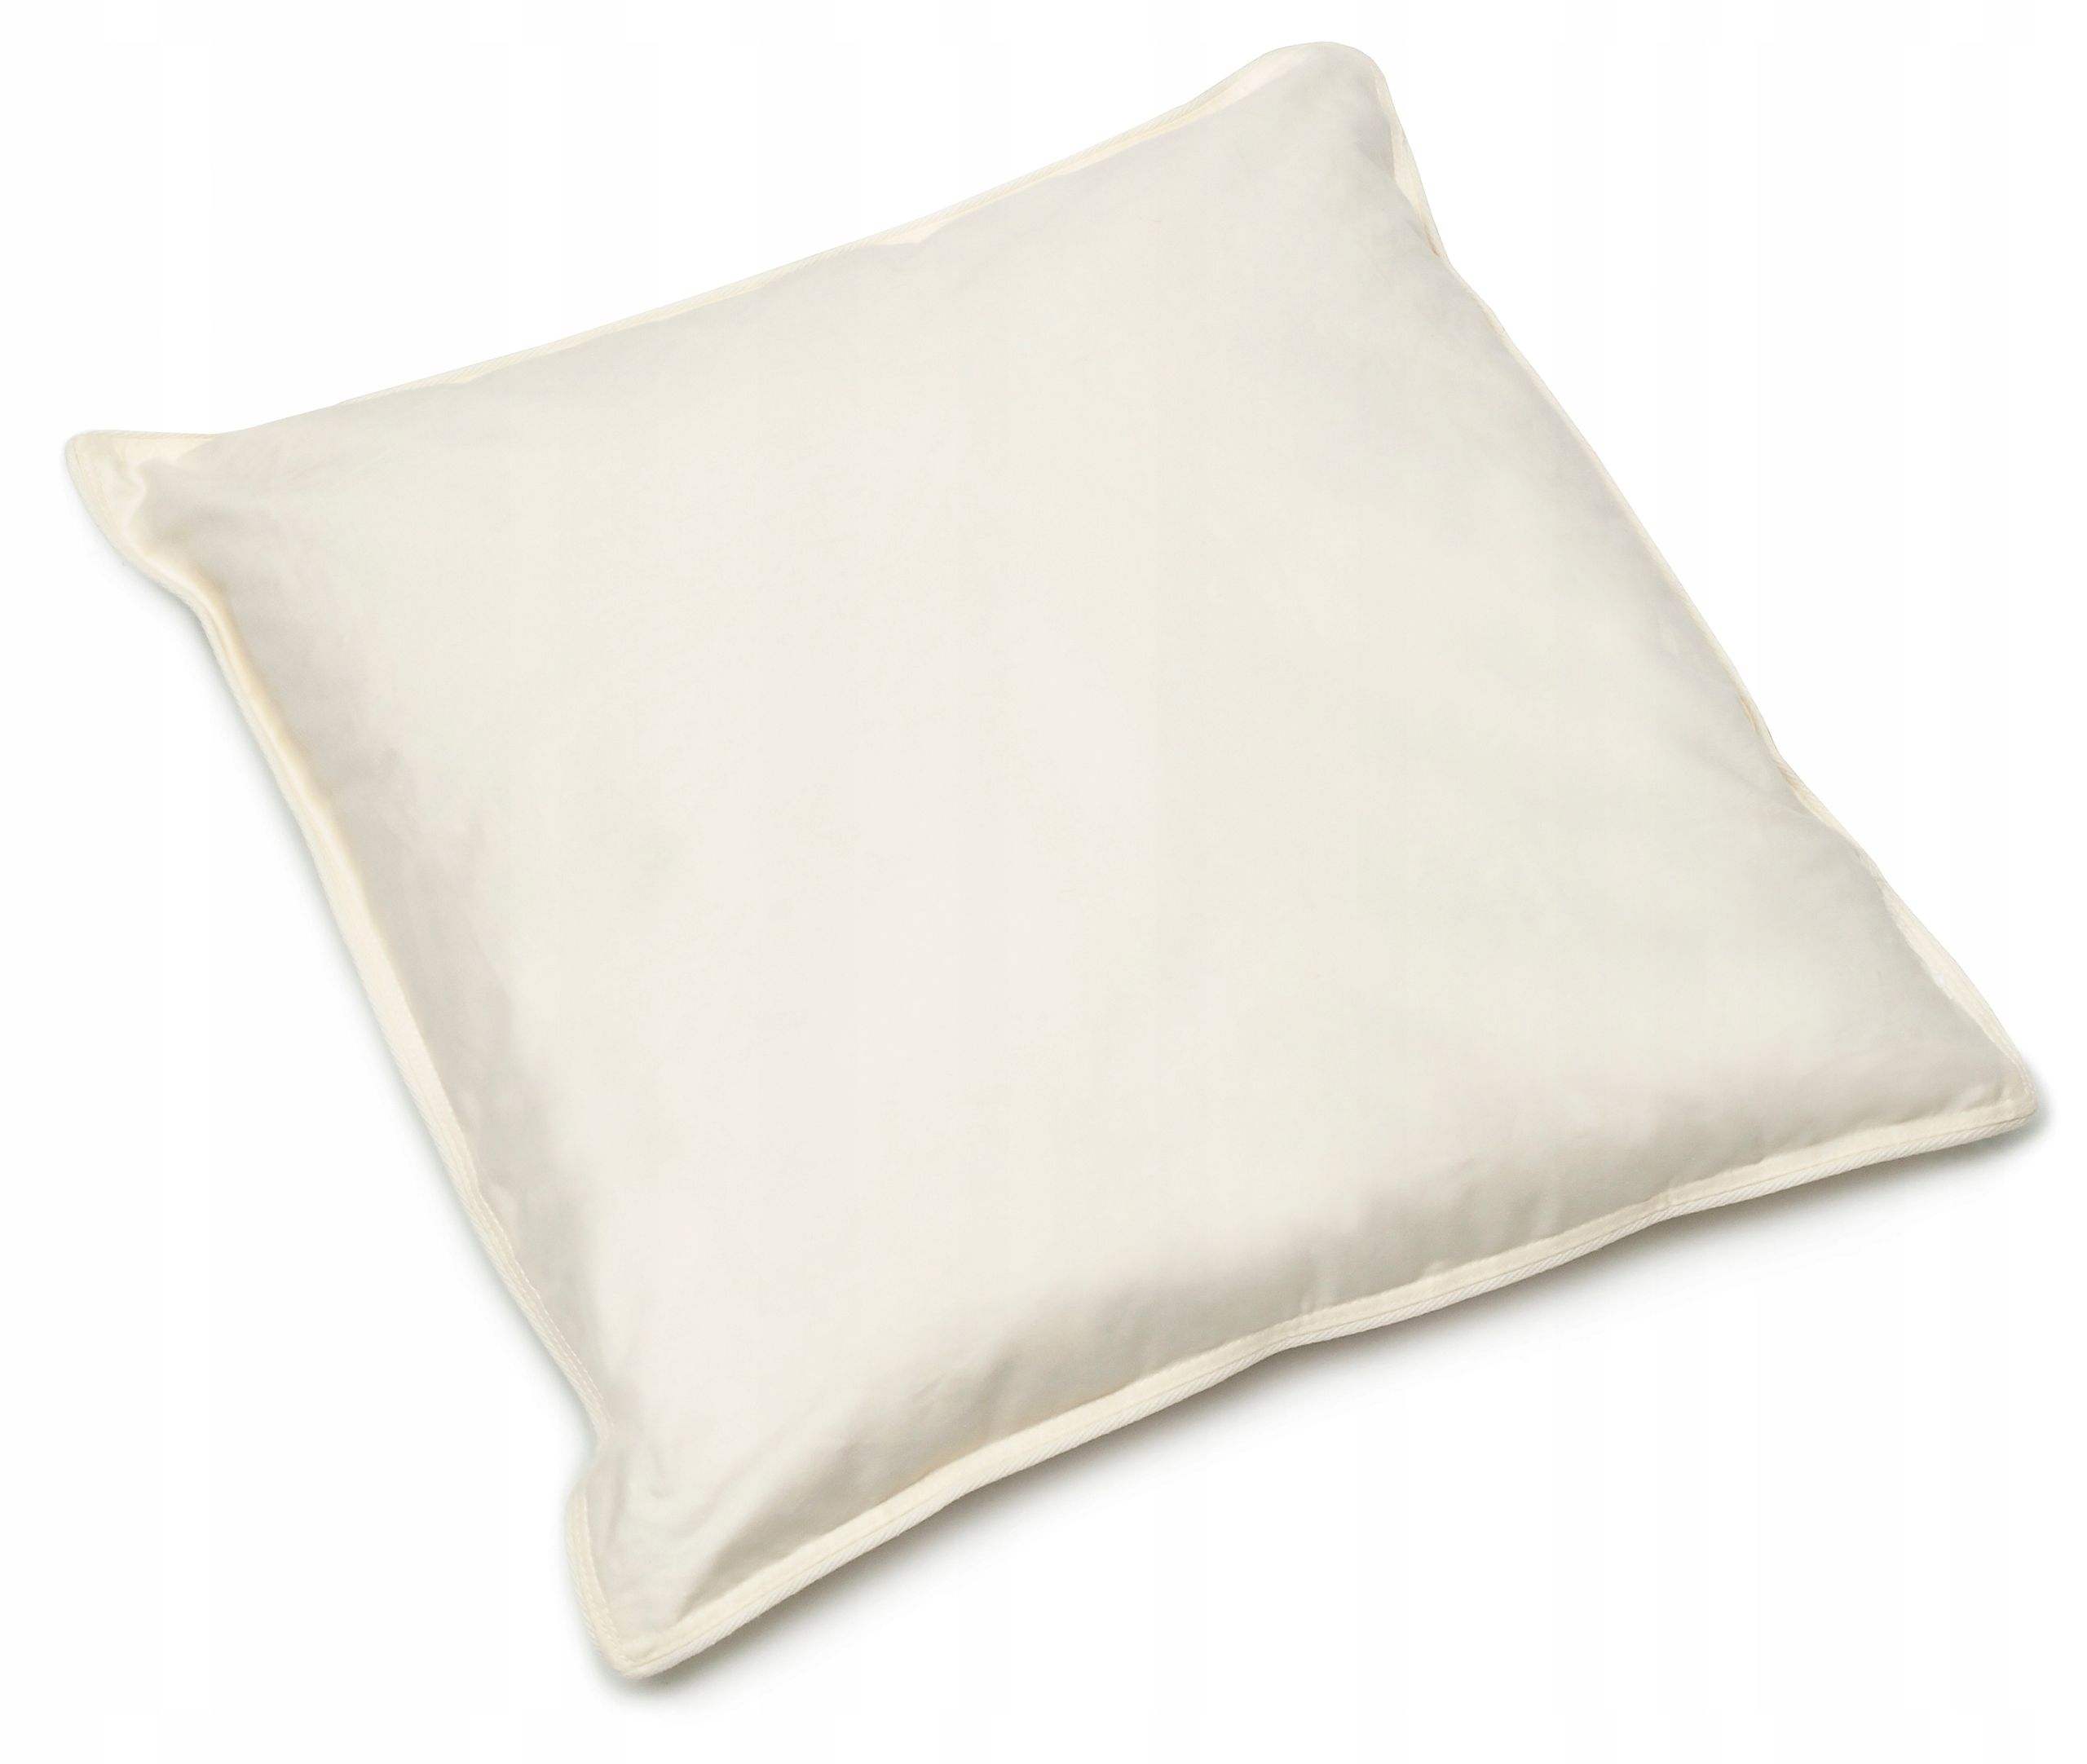 Poduszka 60x70 Pierze Polpuchowa Bawelna Kremowa Pillows Bed Pillows Pillow Cases